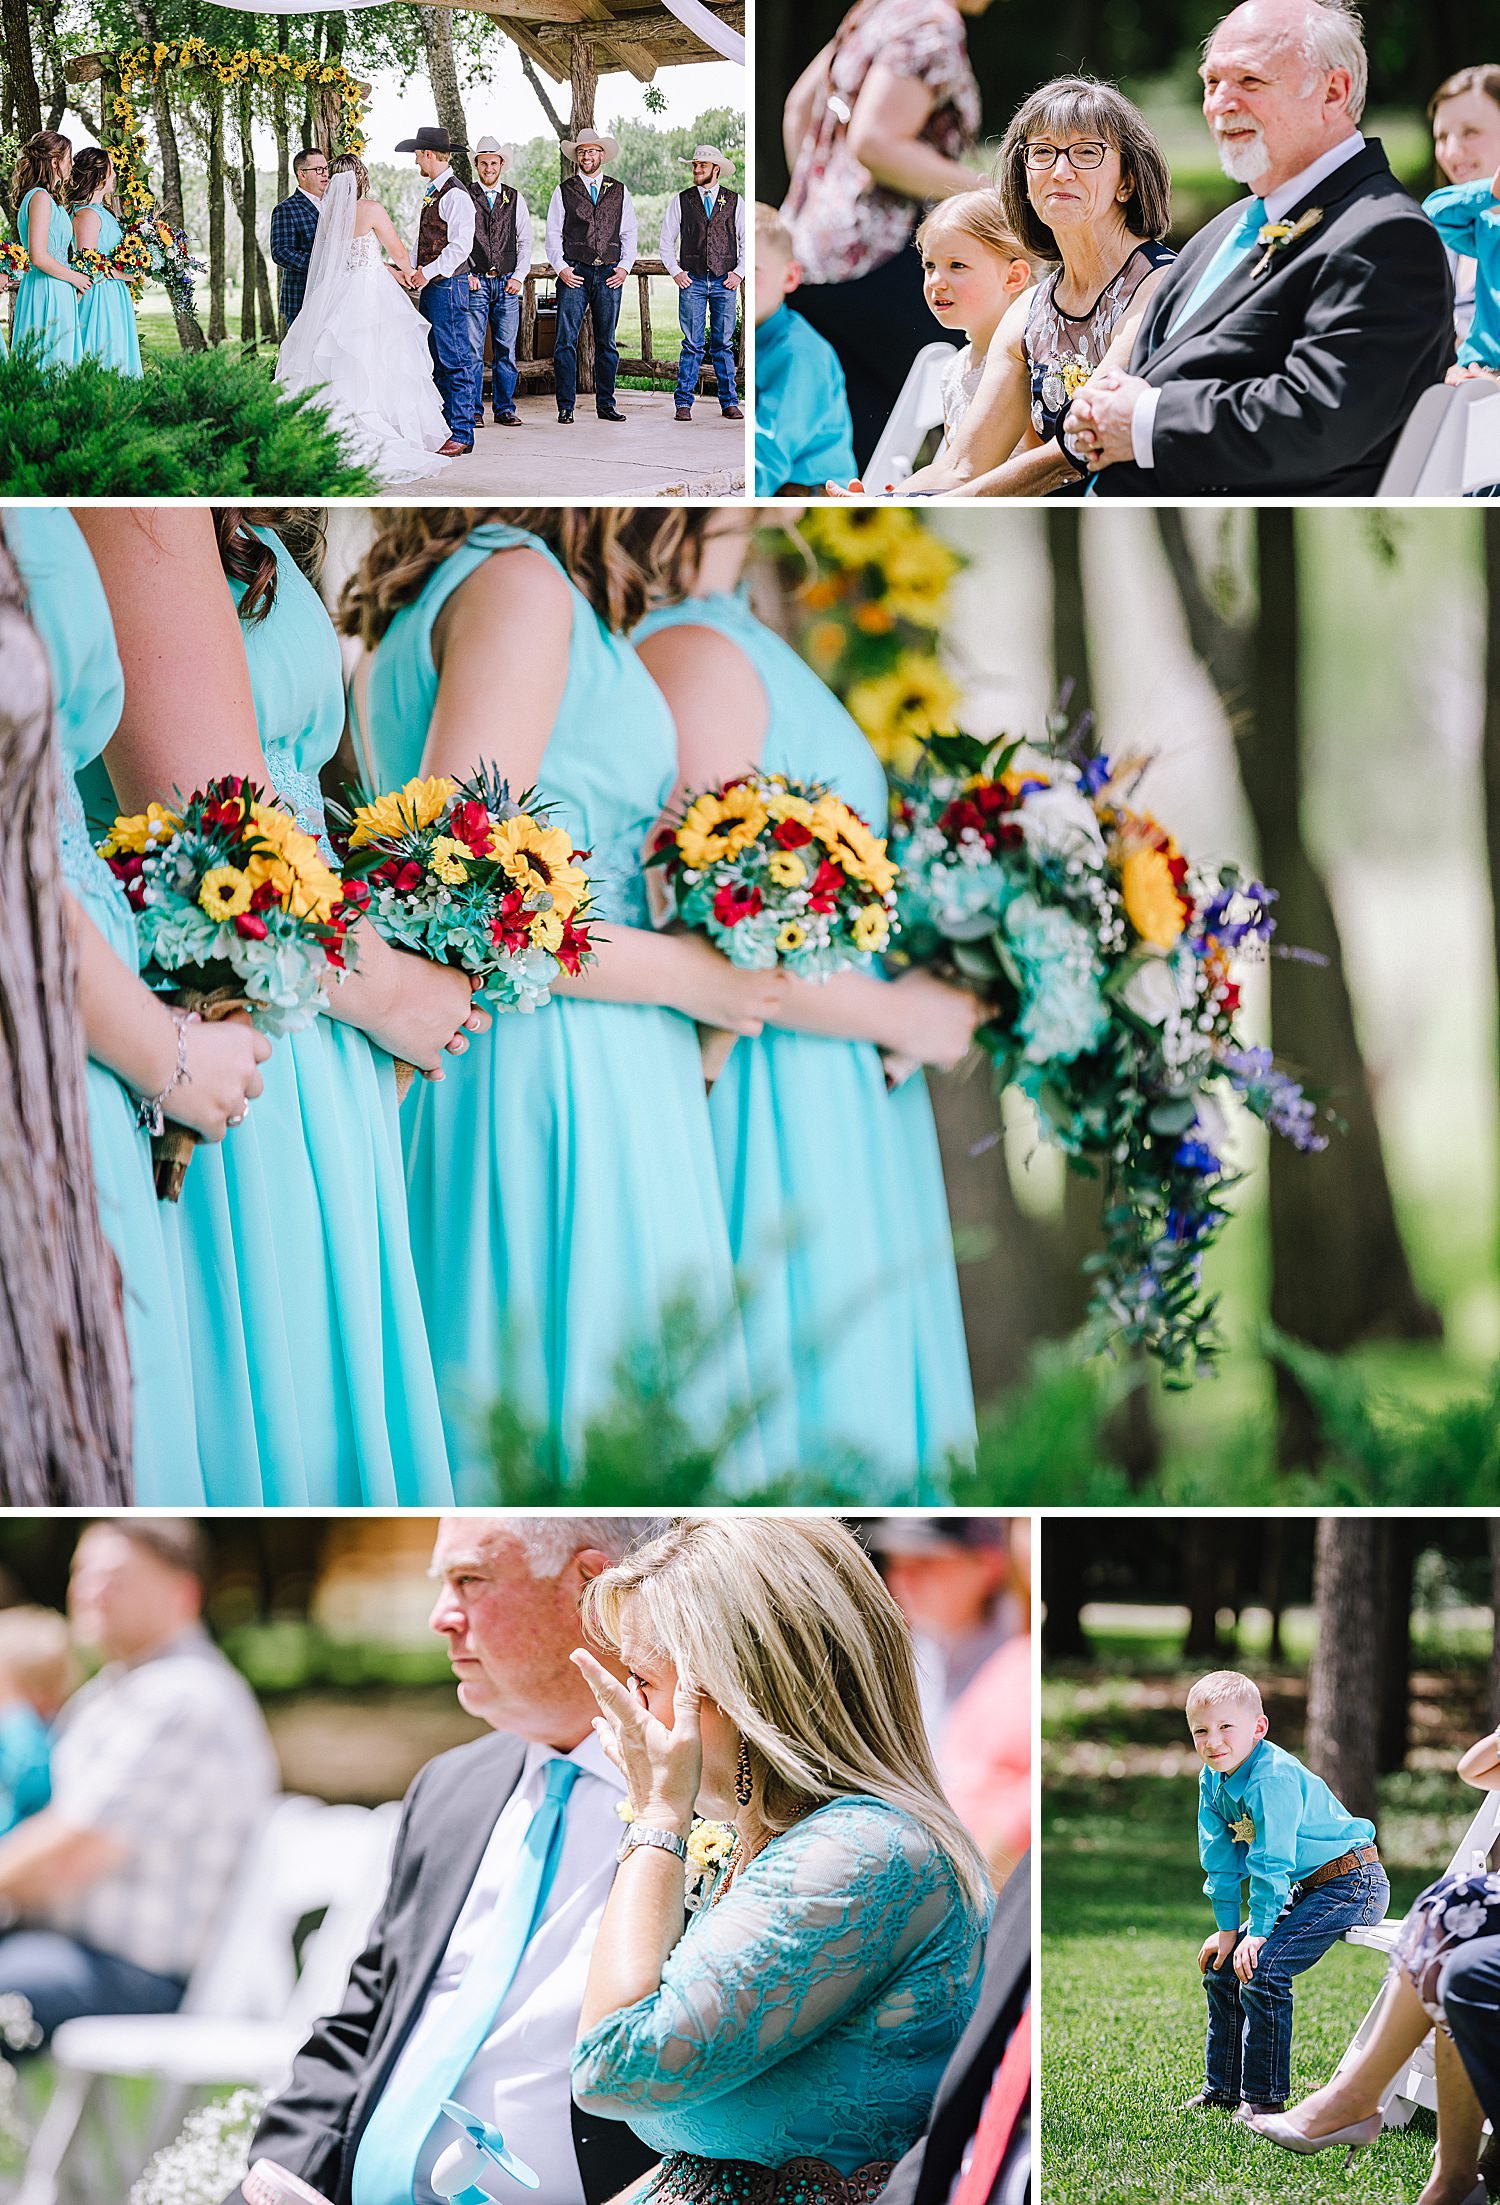 Carly-Barton-Photography-Old-Town-Texas-Rustic-Wedding-Photos-Sunflowers-Boots-Kyle-Texas_0038.jpg